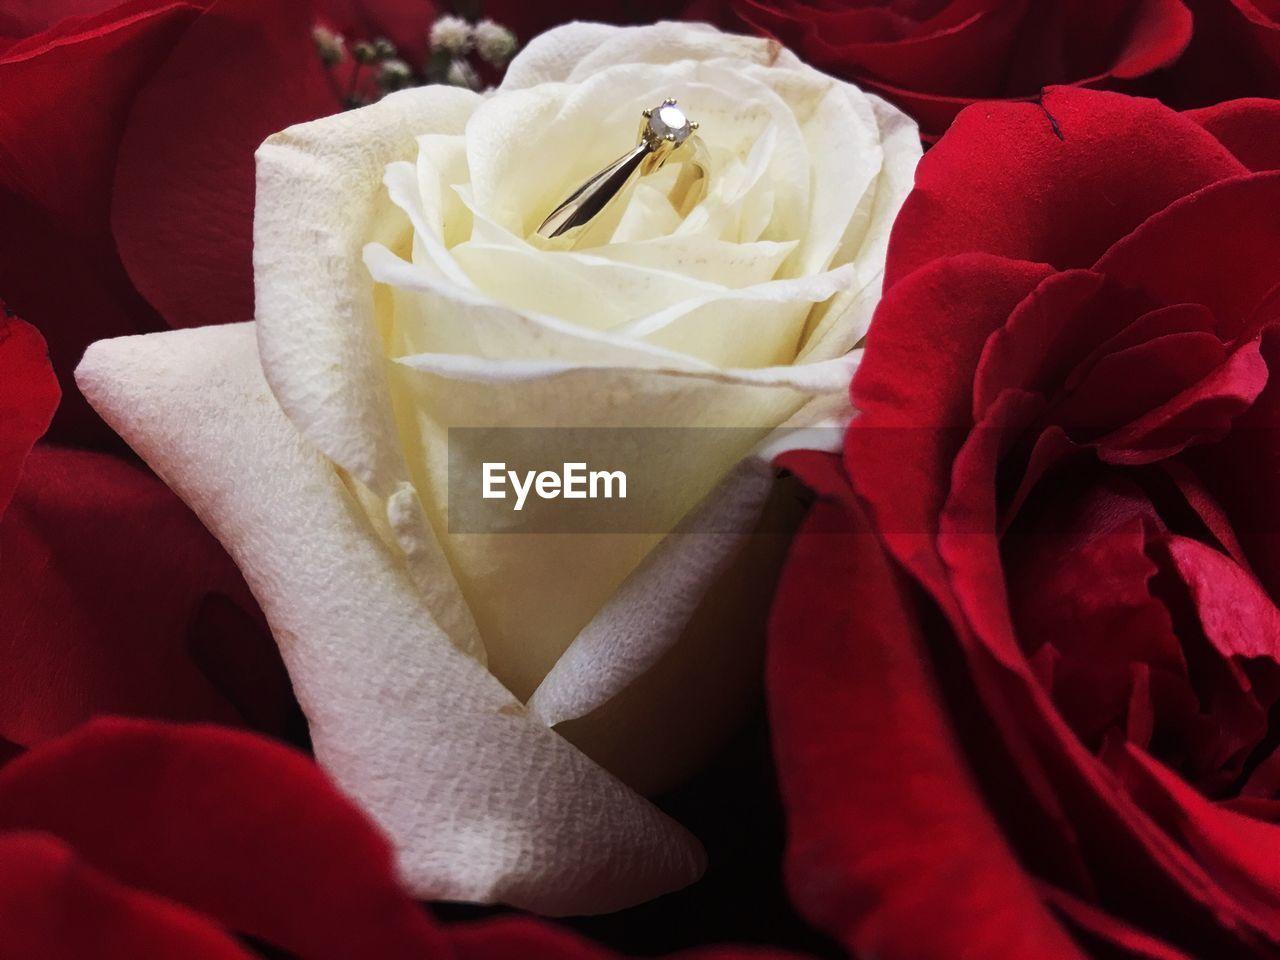 Diamond ring on white rose